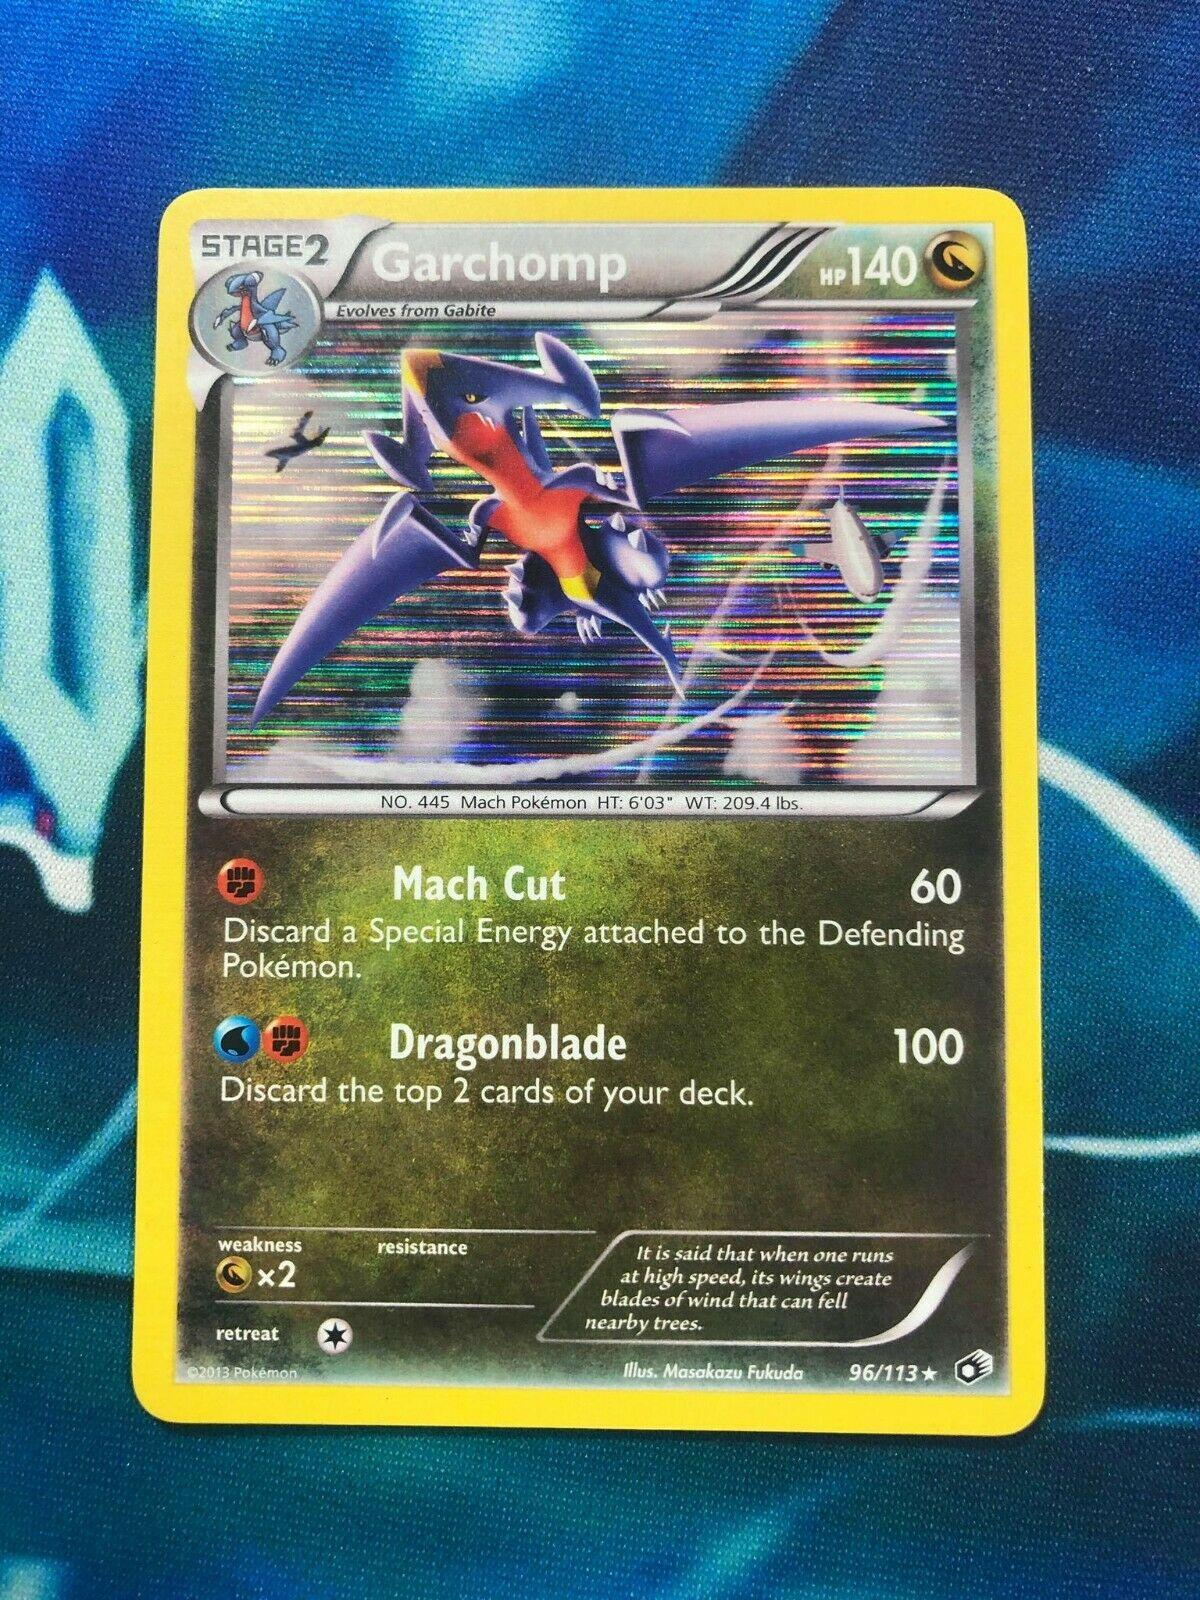 96//113 Legendary Treasures Pokemon 3DY Holo Rare NM B/&W Garchomp